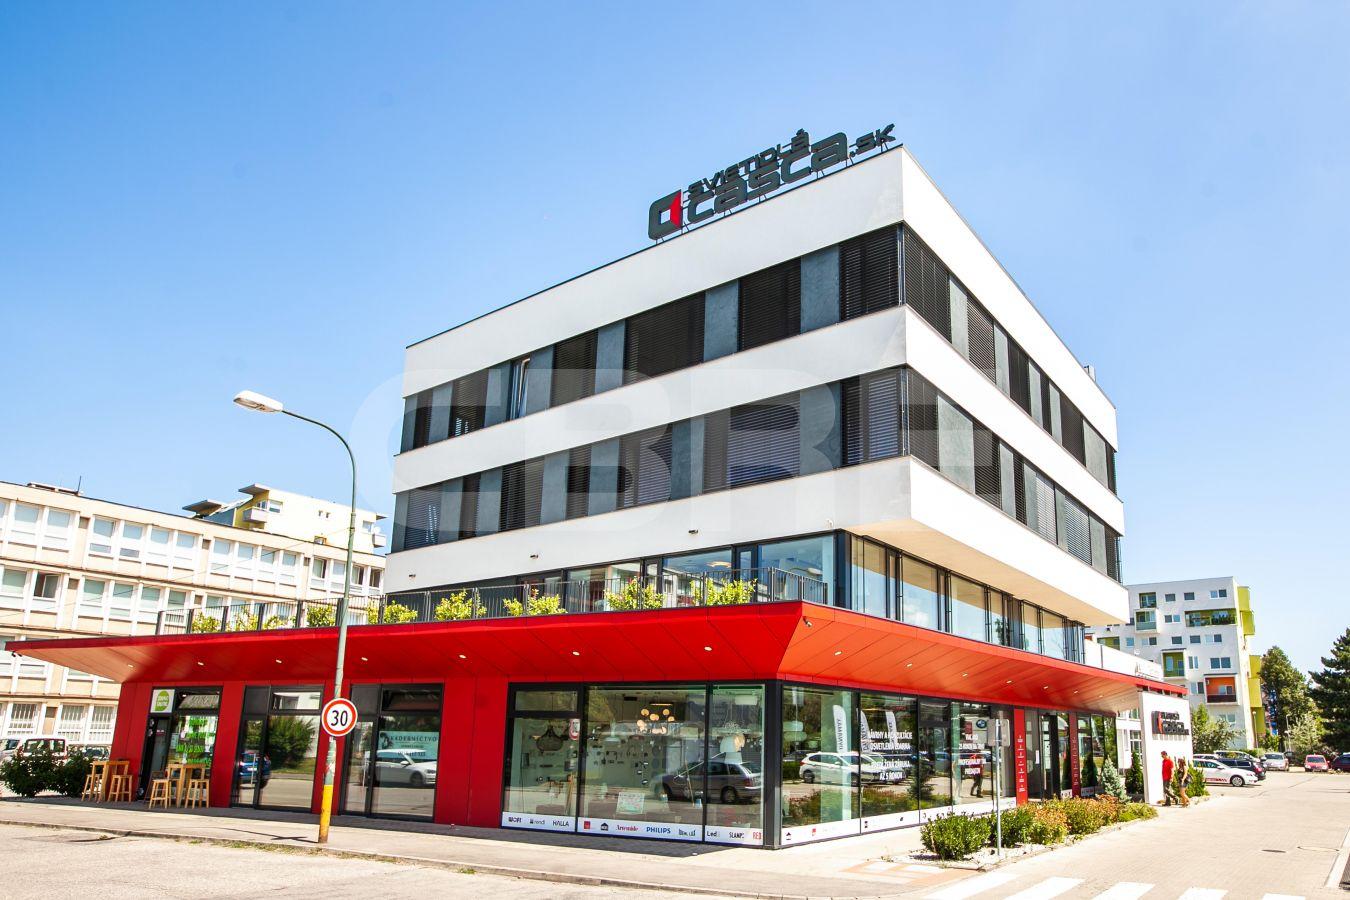 Casca - Ivánska cesta, Bratislava - Ružinov | Offices for rent by CBRE | 3